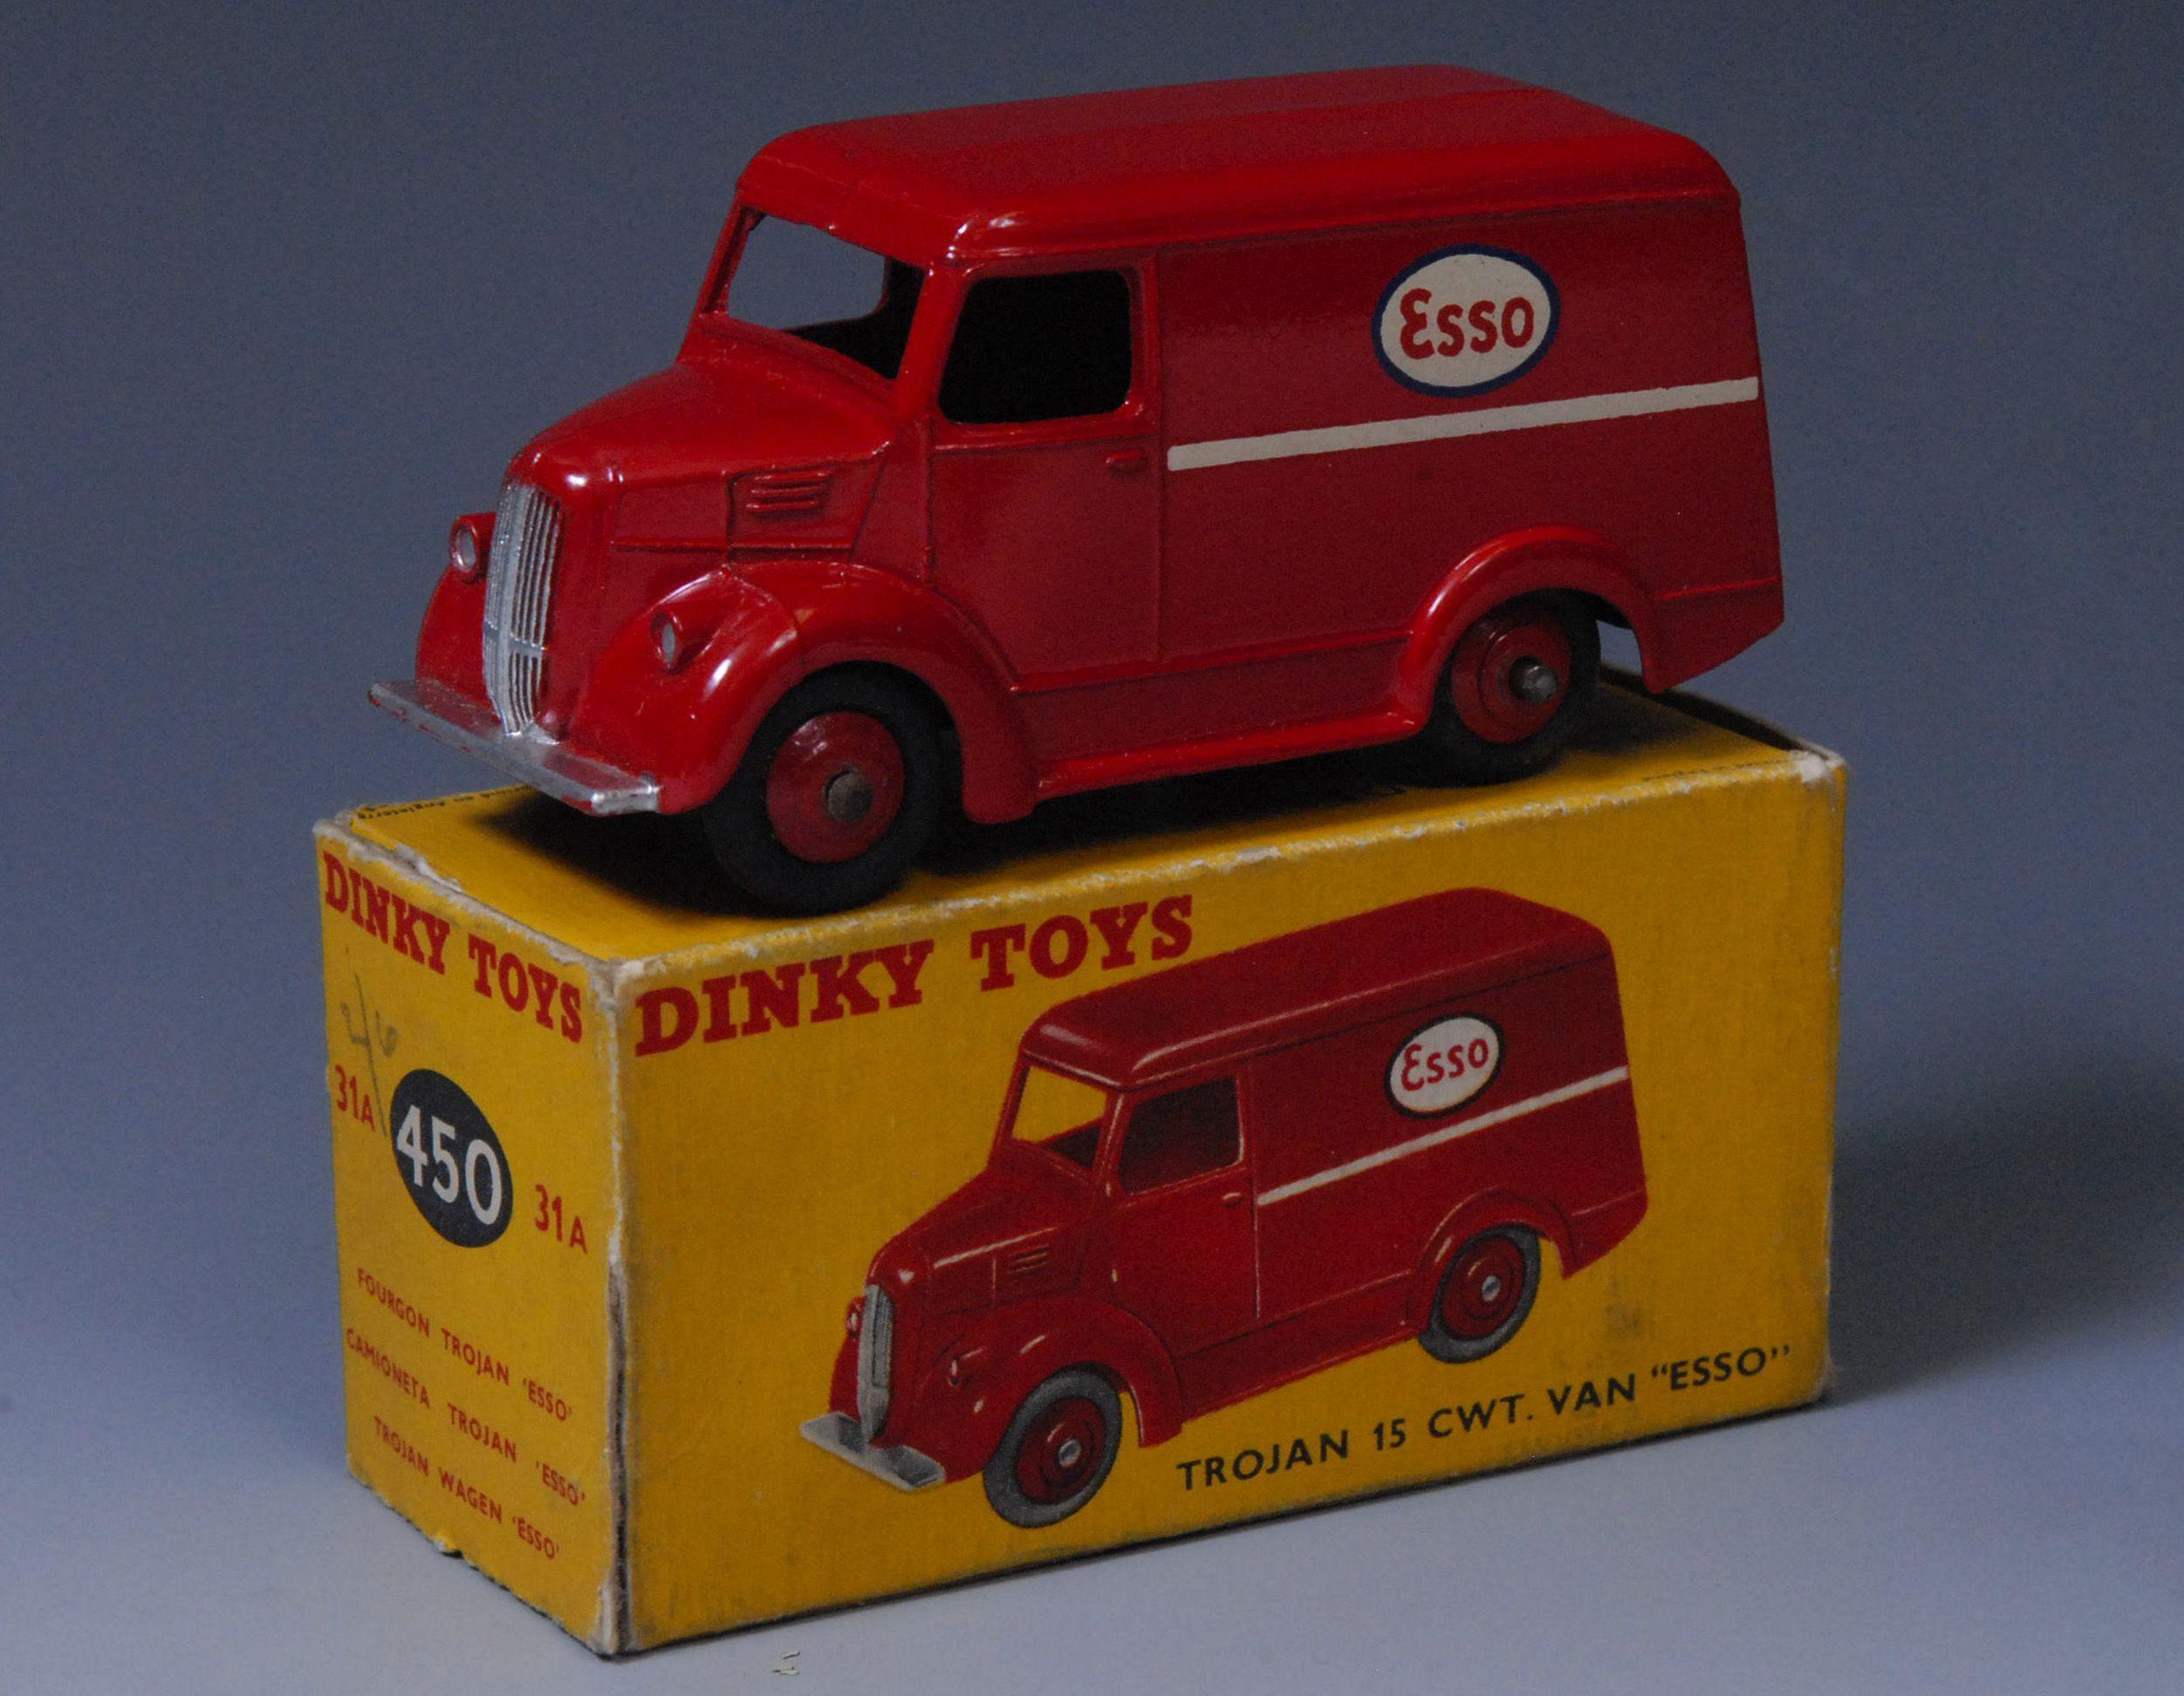 Dinky Toy Trojan Miniaturas - Veiculos Toys Corgi